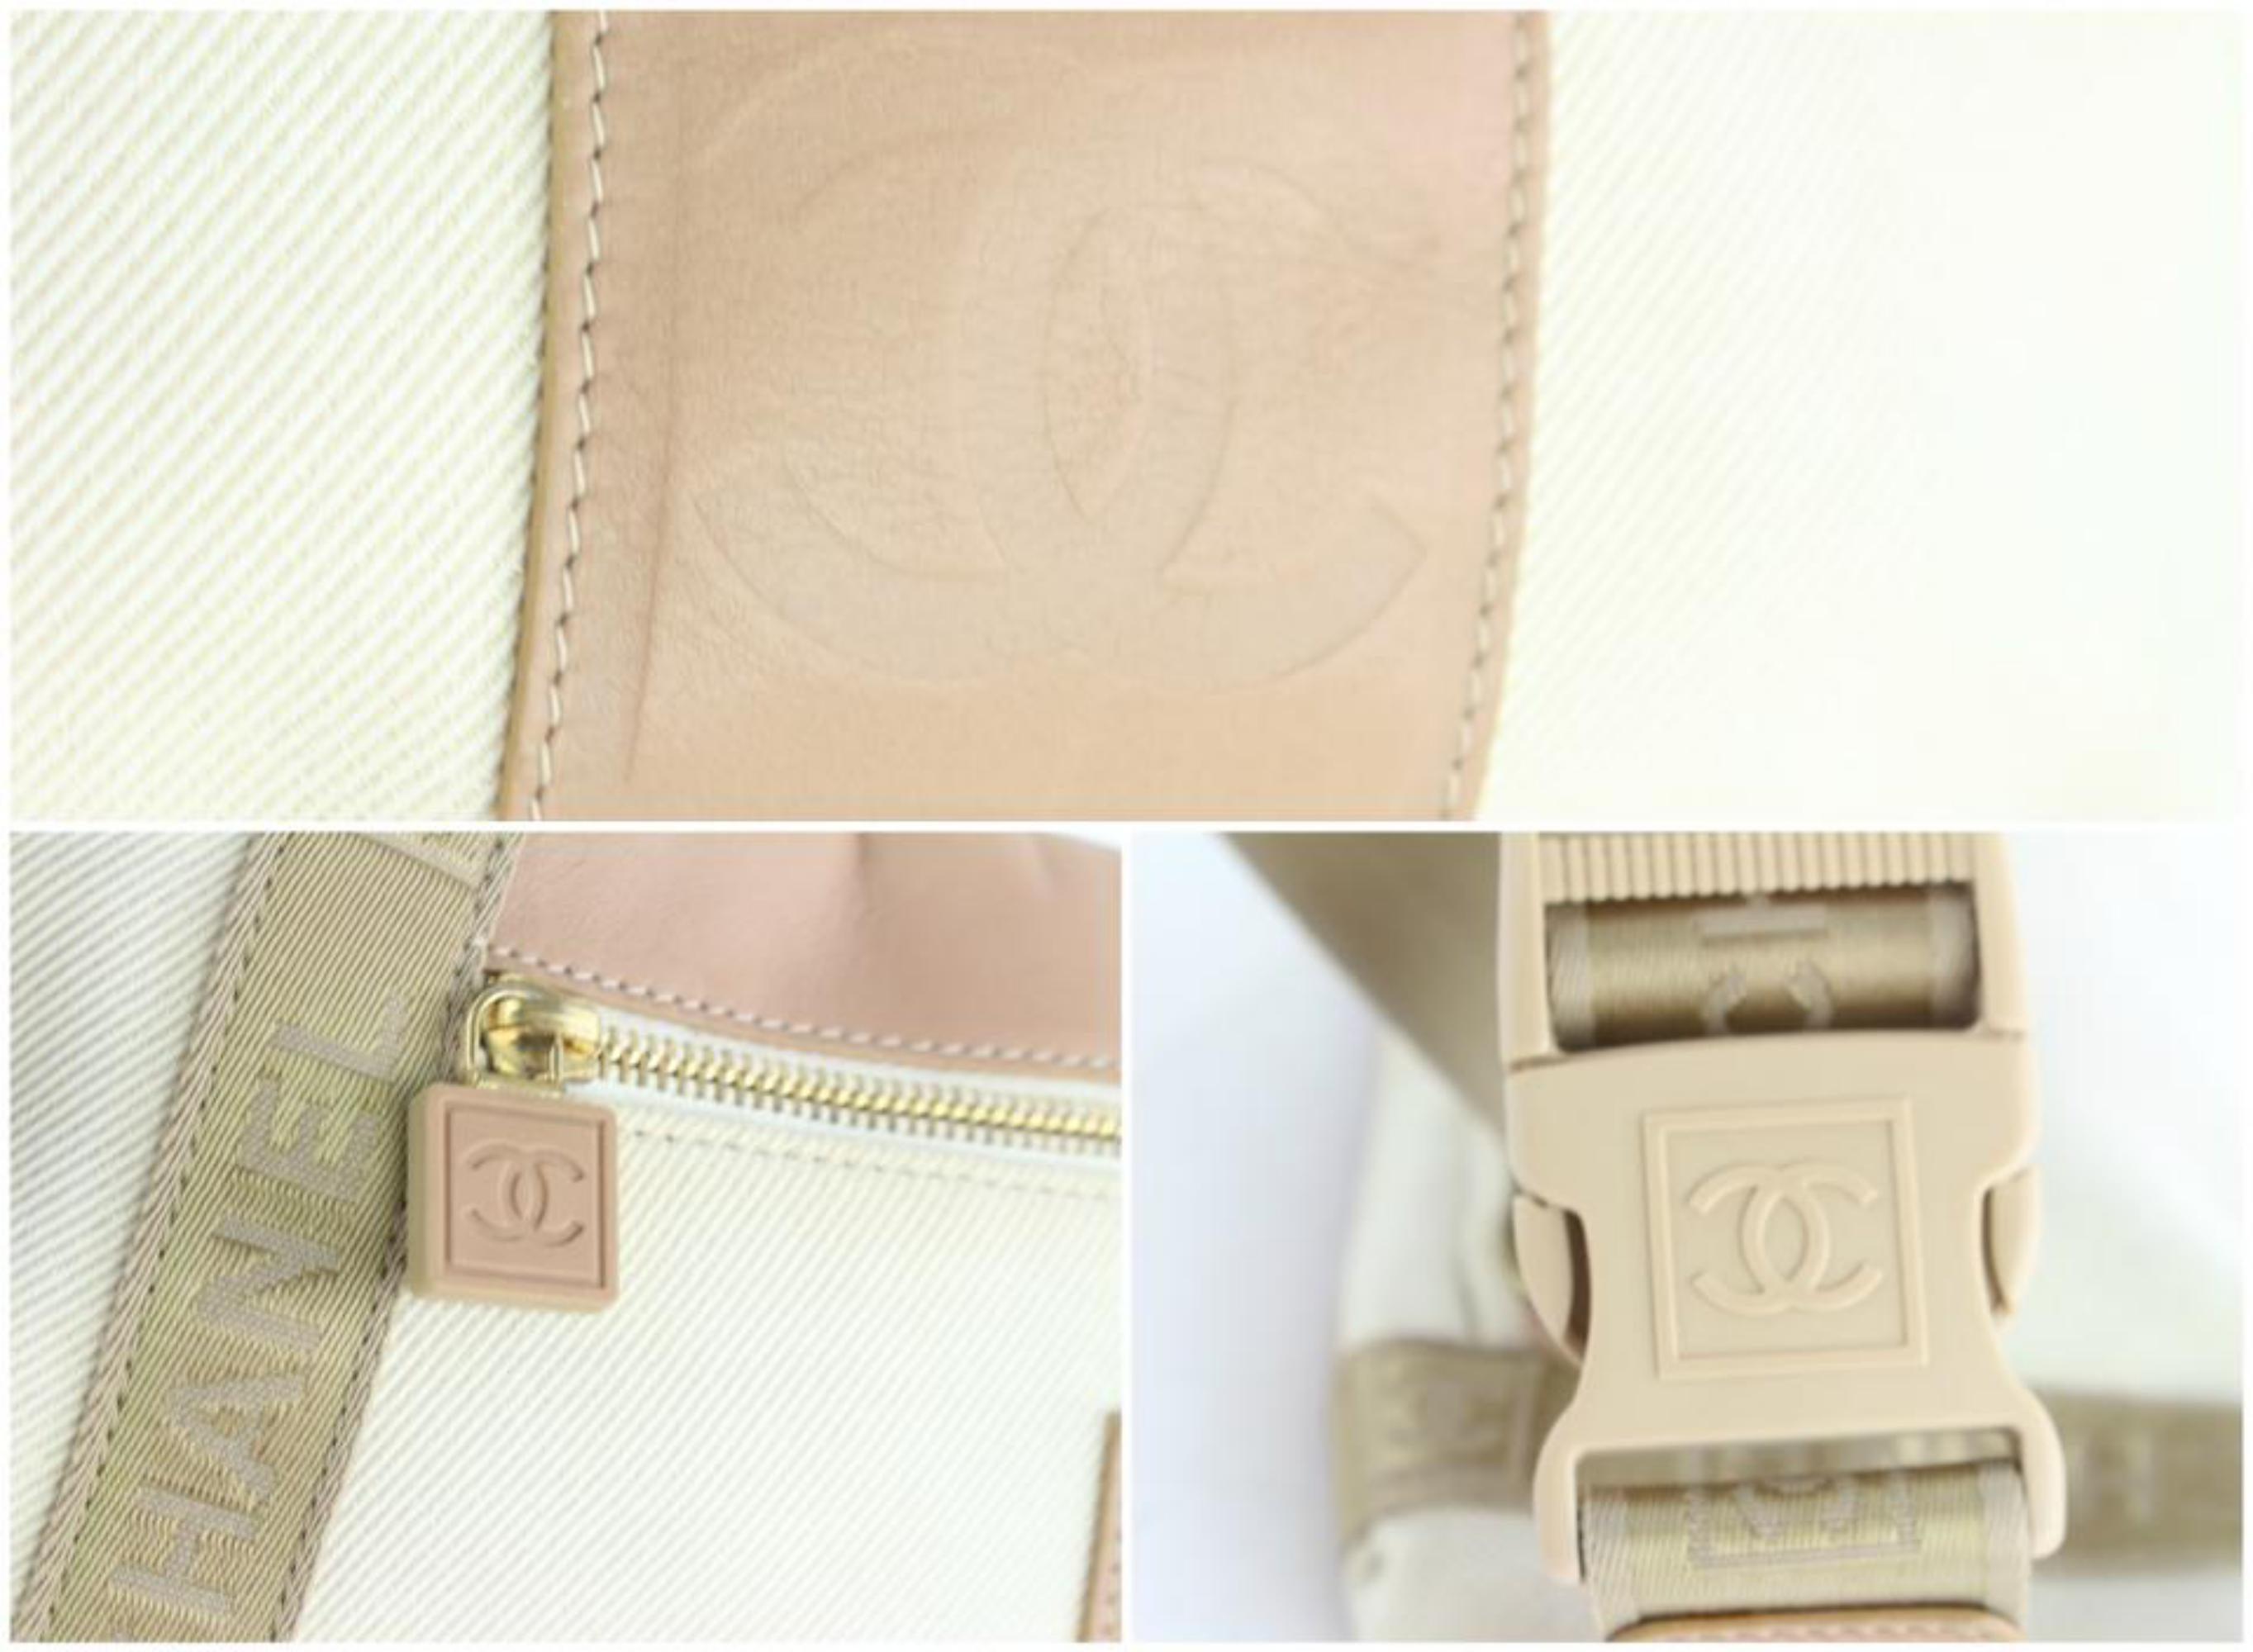 06542e8618fc Chanel Waist Pouch Fanny Pack Belt 16cz1130 Beige Canvas Cross Body Bag at  1stdibs